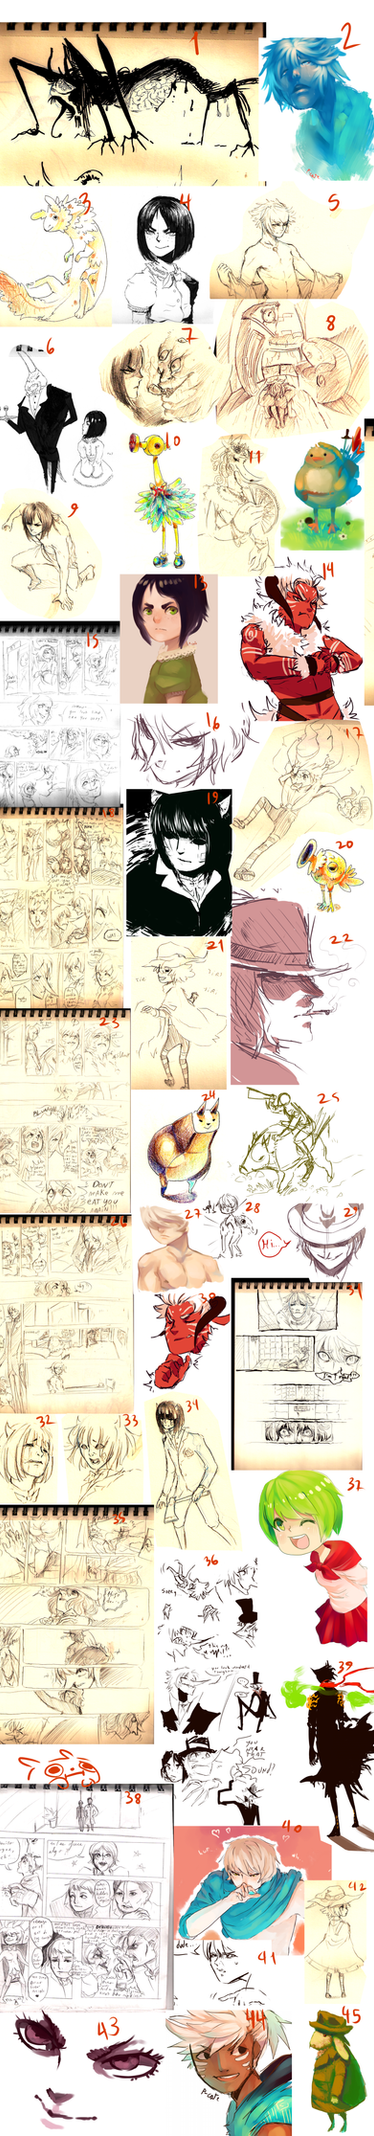 sketchdump 7-HAGDFBJSD by P-cate